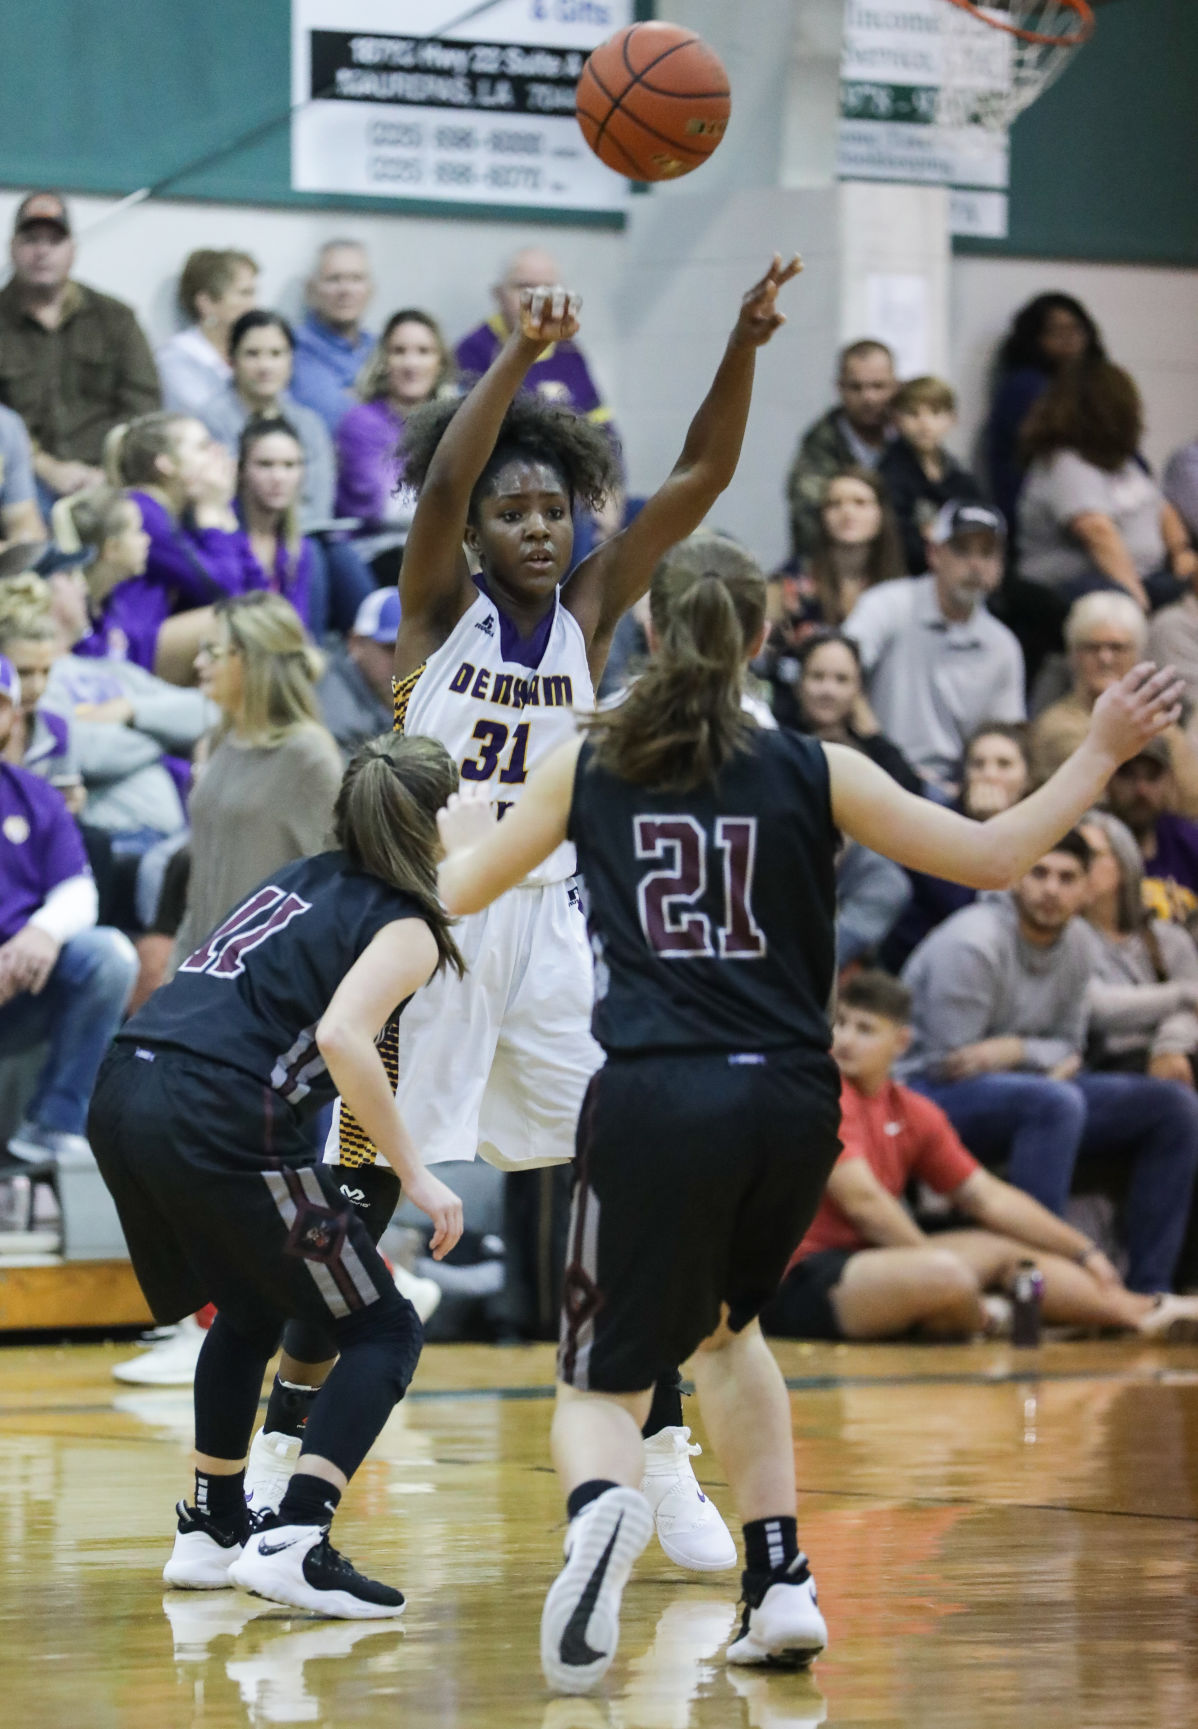 Albany vs Denham Springs girls basketball Alexius Horne Haley Meyers Devyn Hoyt